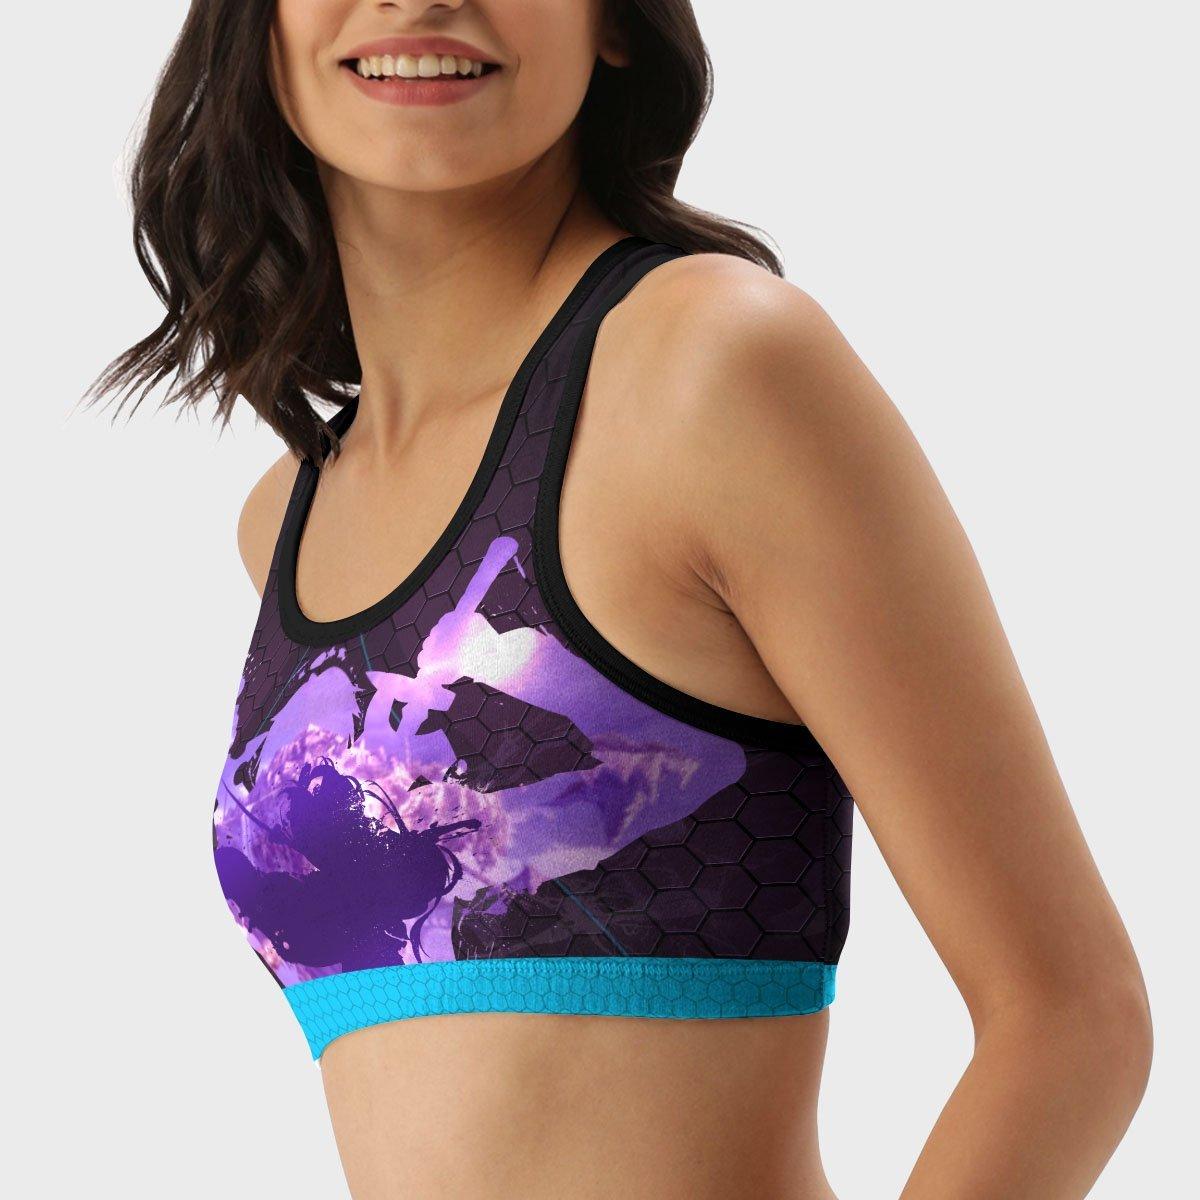 sao summer active wear set 912169 - Anime Swimsuits